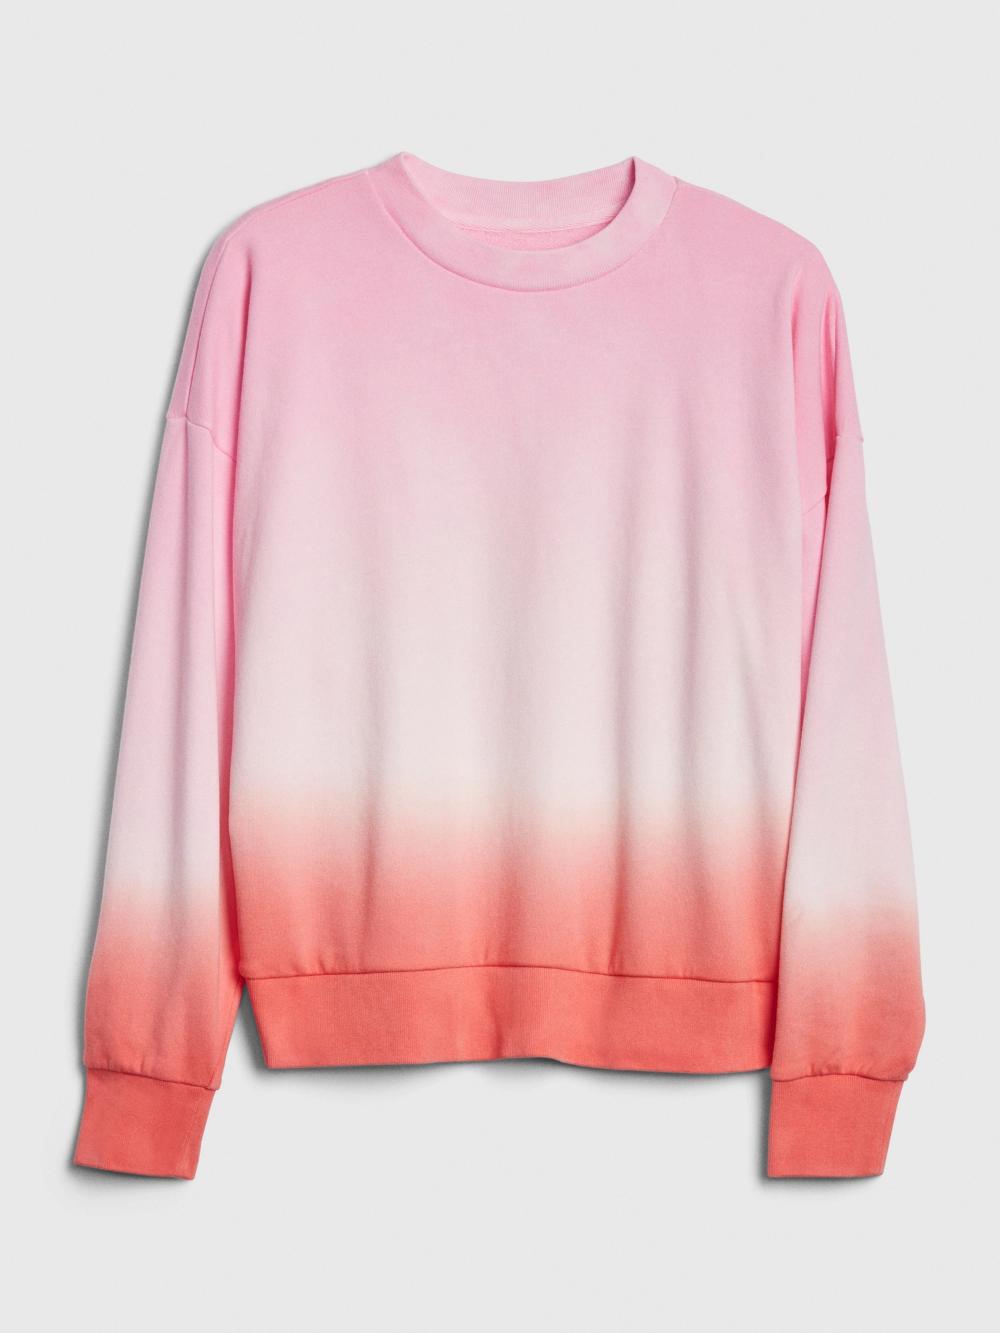 Tie Dye Cropped Sweatshirt In French Terry In 2020 Crop Sweatshirt Tie Dye Sweatshirts [ 1333 x 1000 Pixel ]